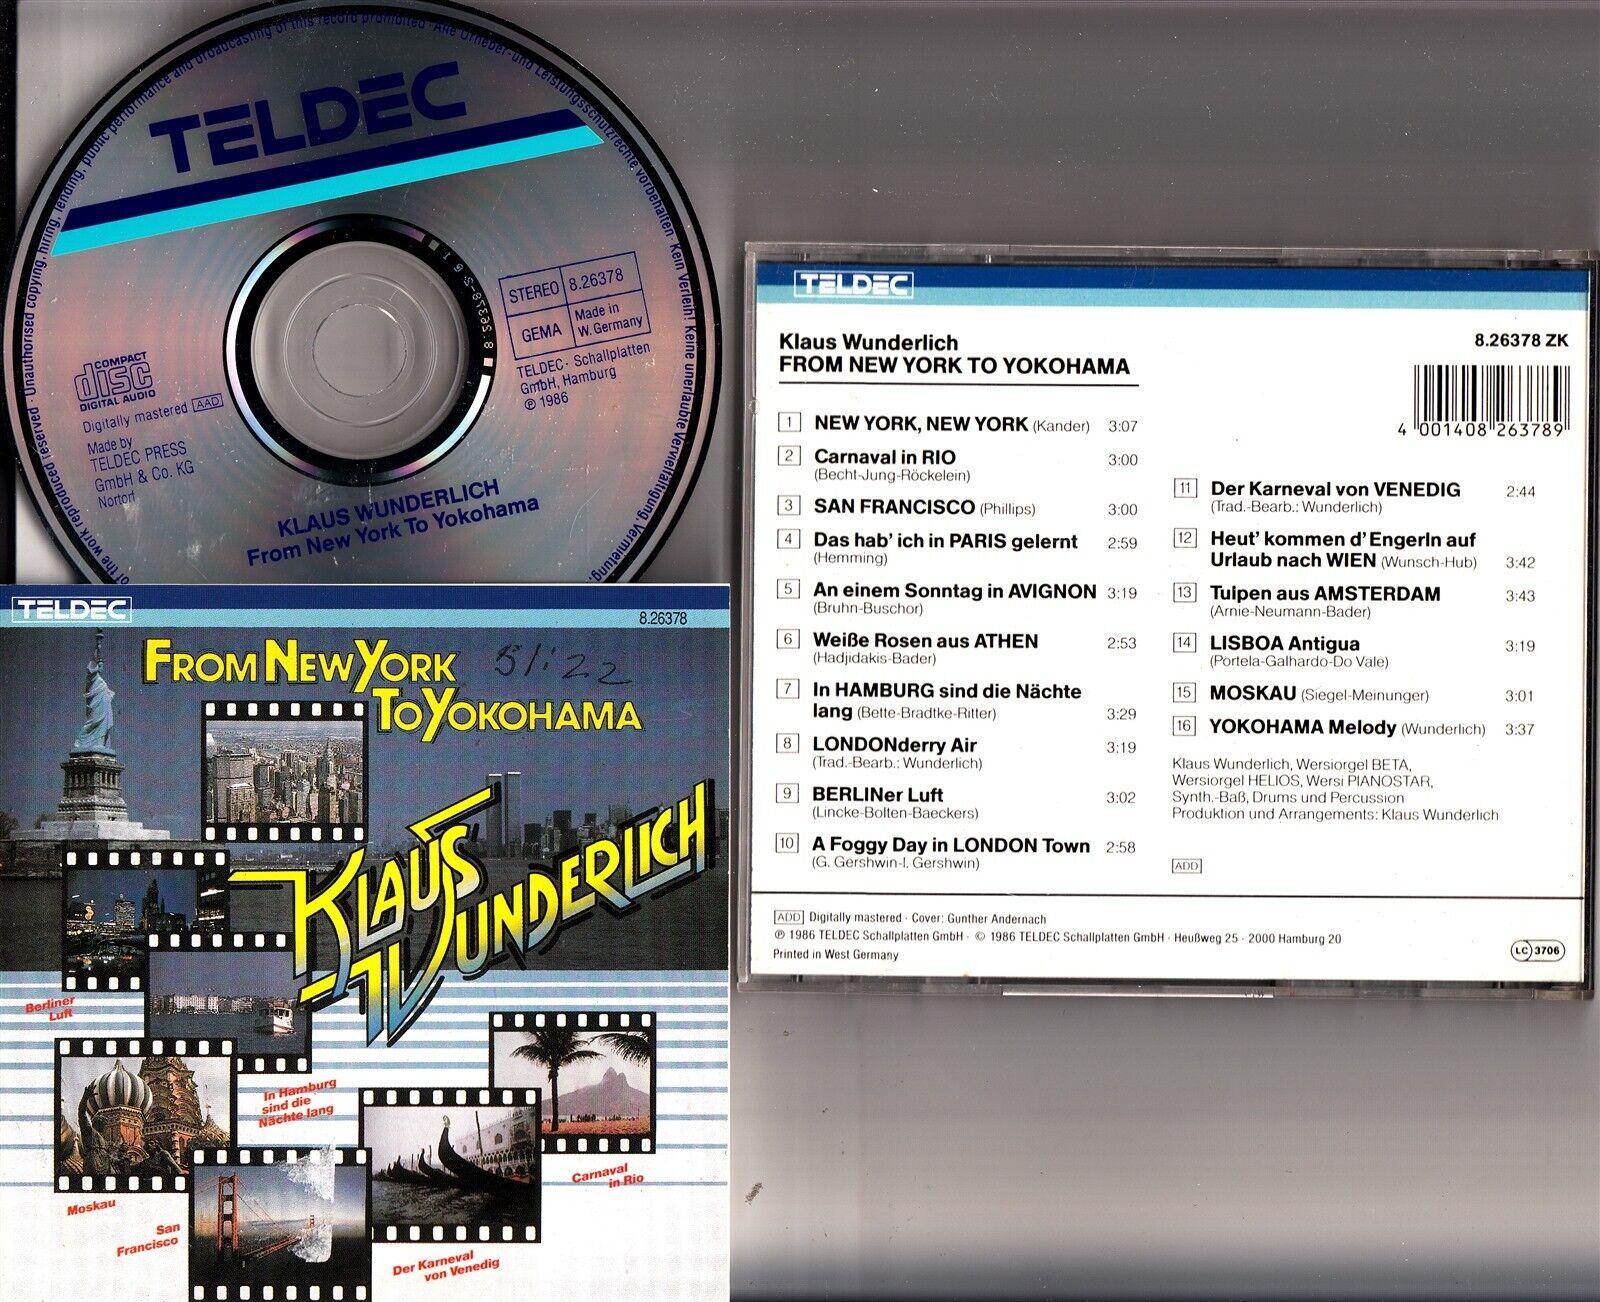 cd8875ee5f7dd1 Details about Klaus Wunderlich - From New York To Yokohama CD (1986  W.Germany) Wersi Organ